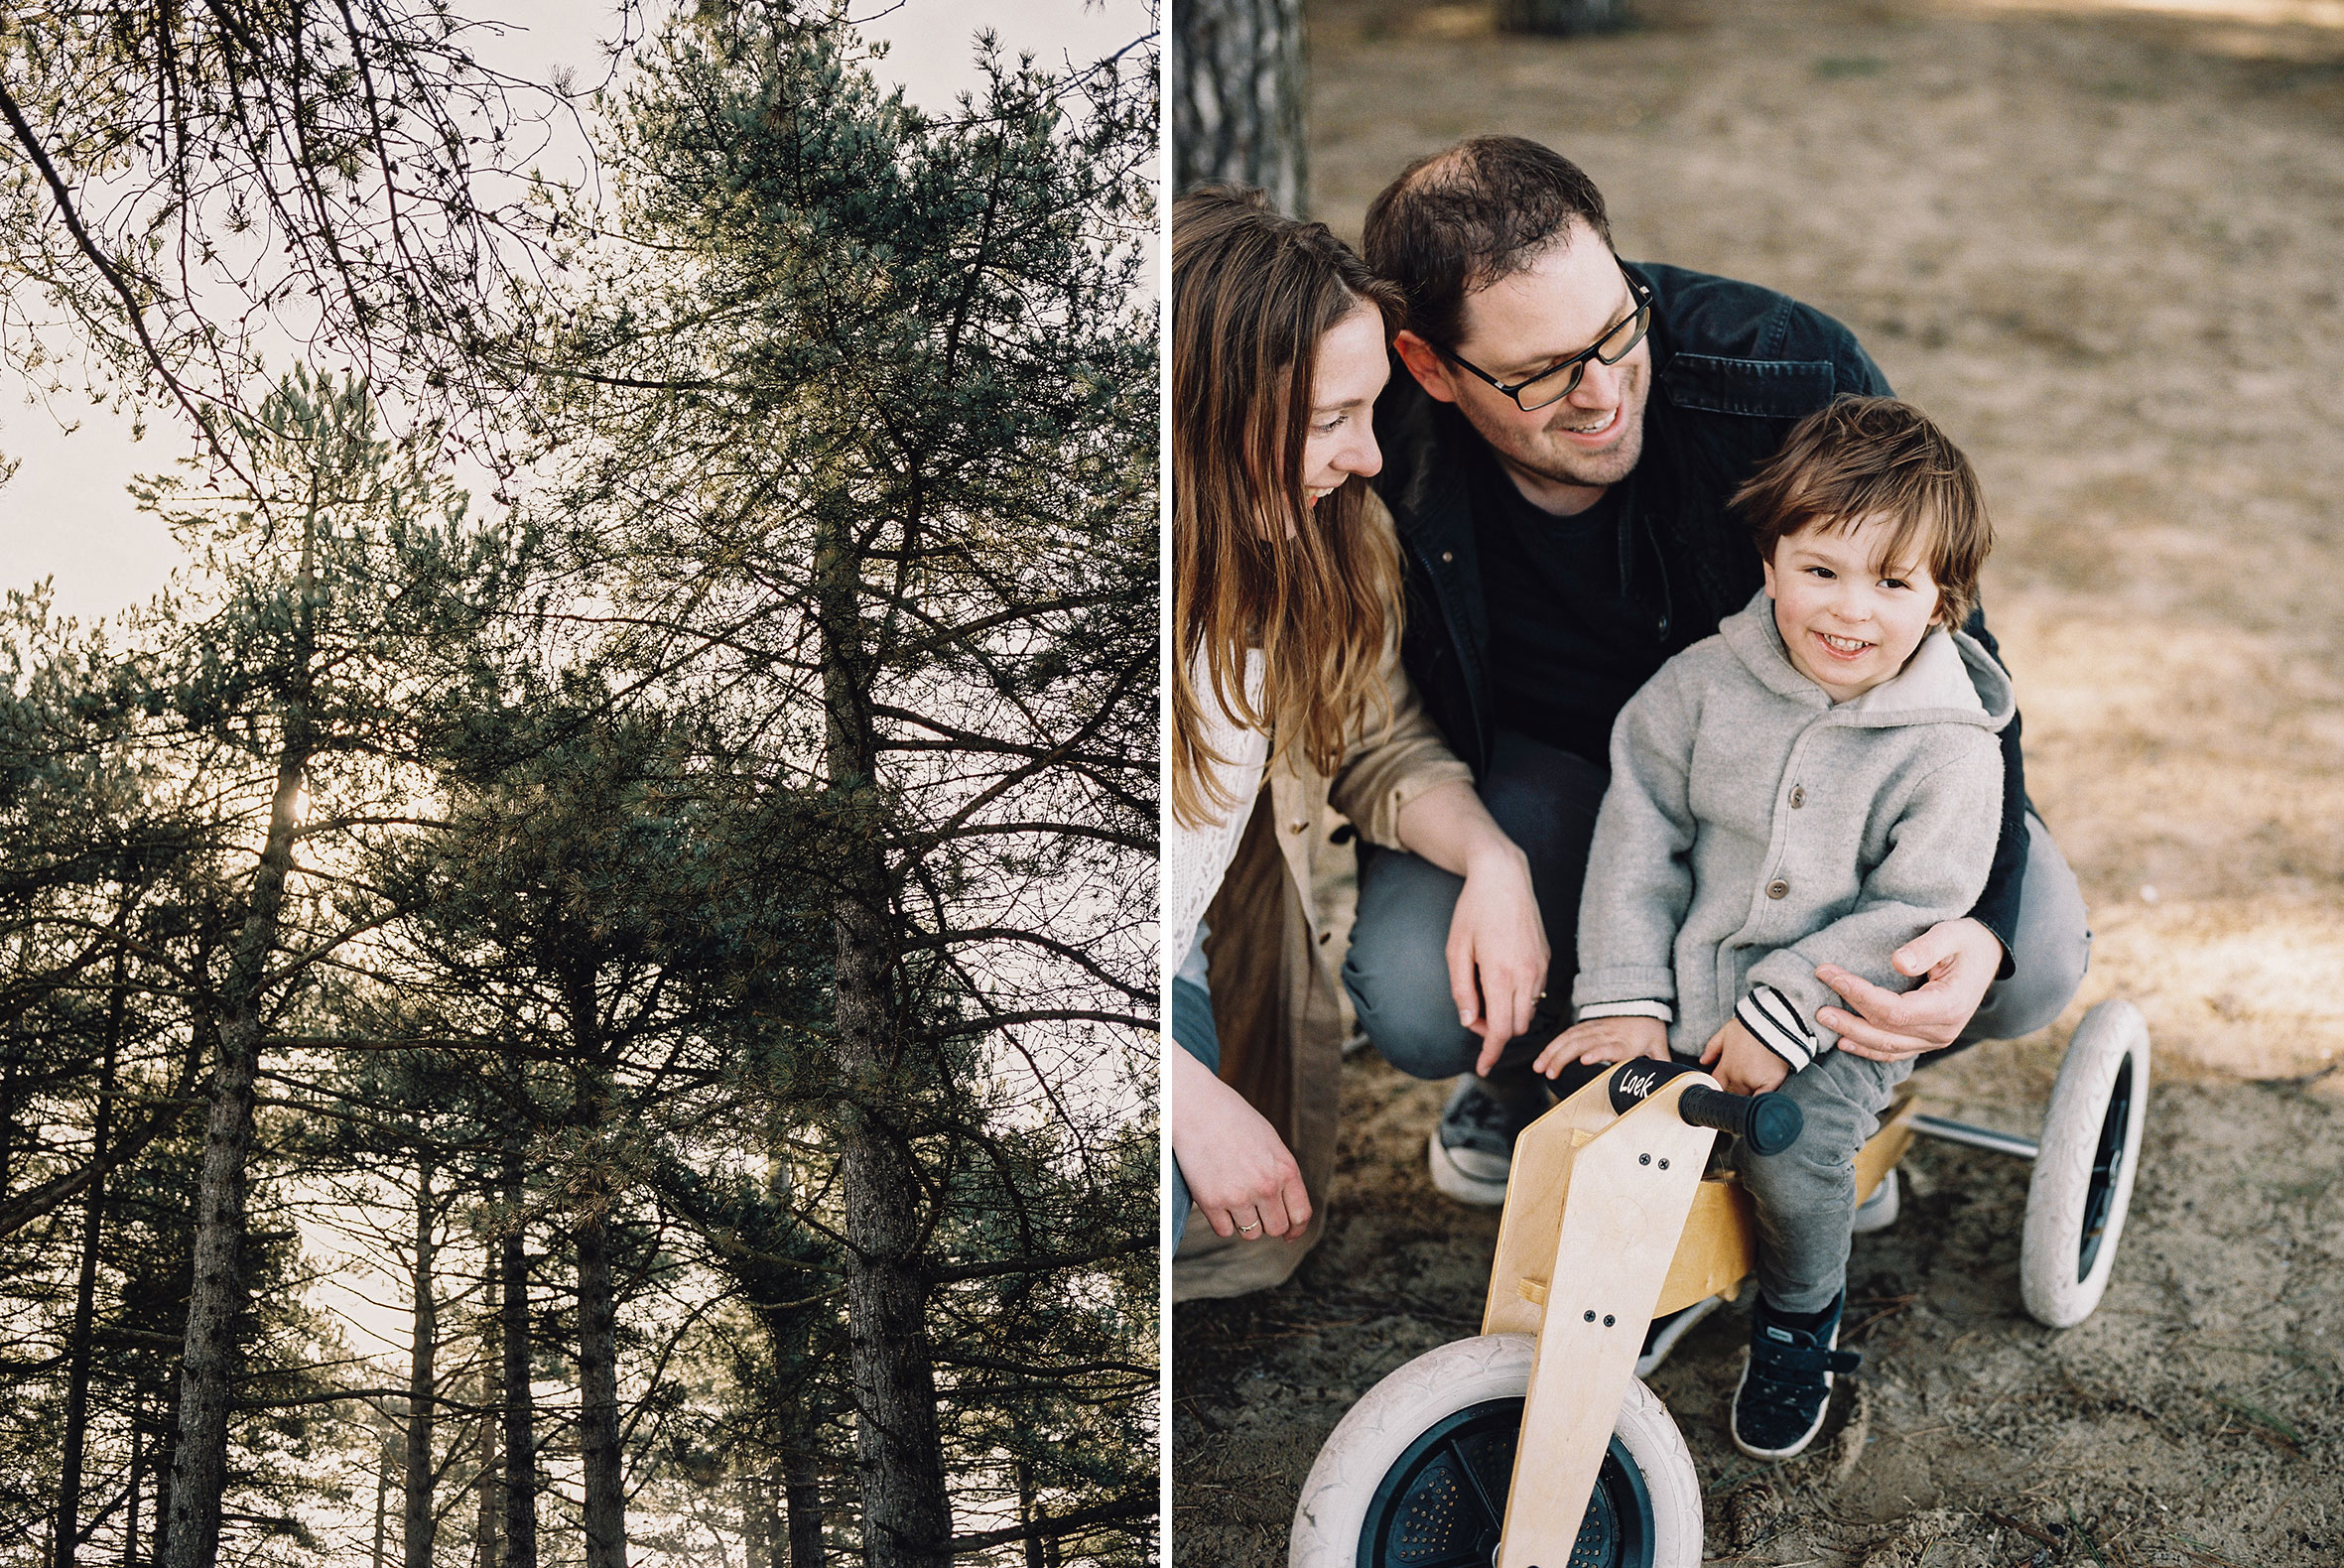 fotoshoot gezin familieshoot familyshoot hanke arkenbout